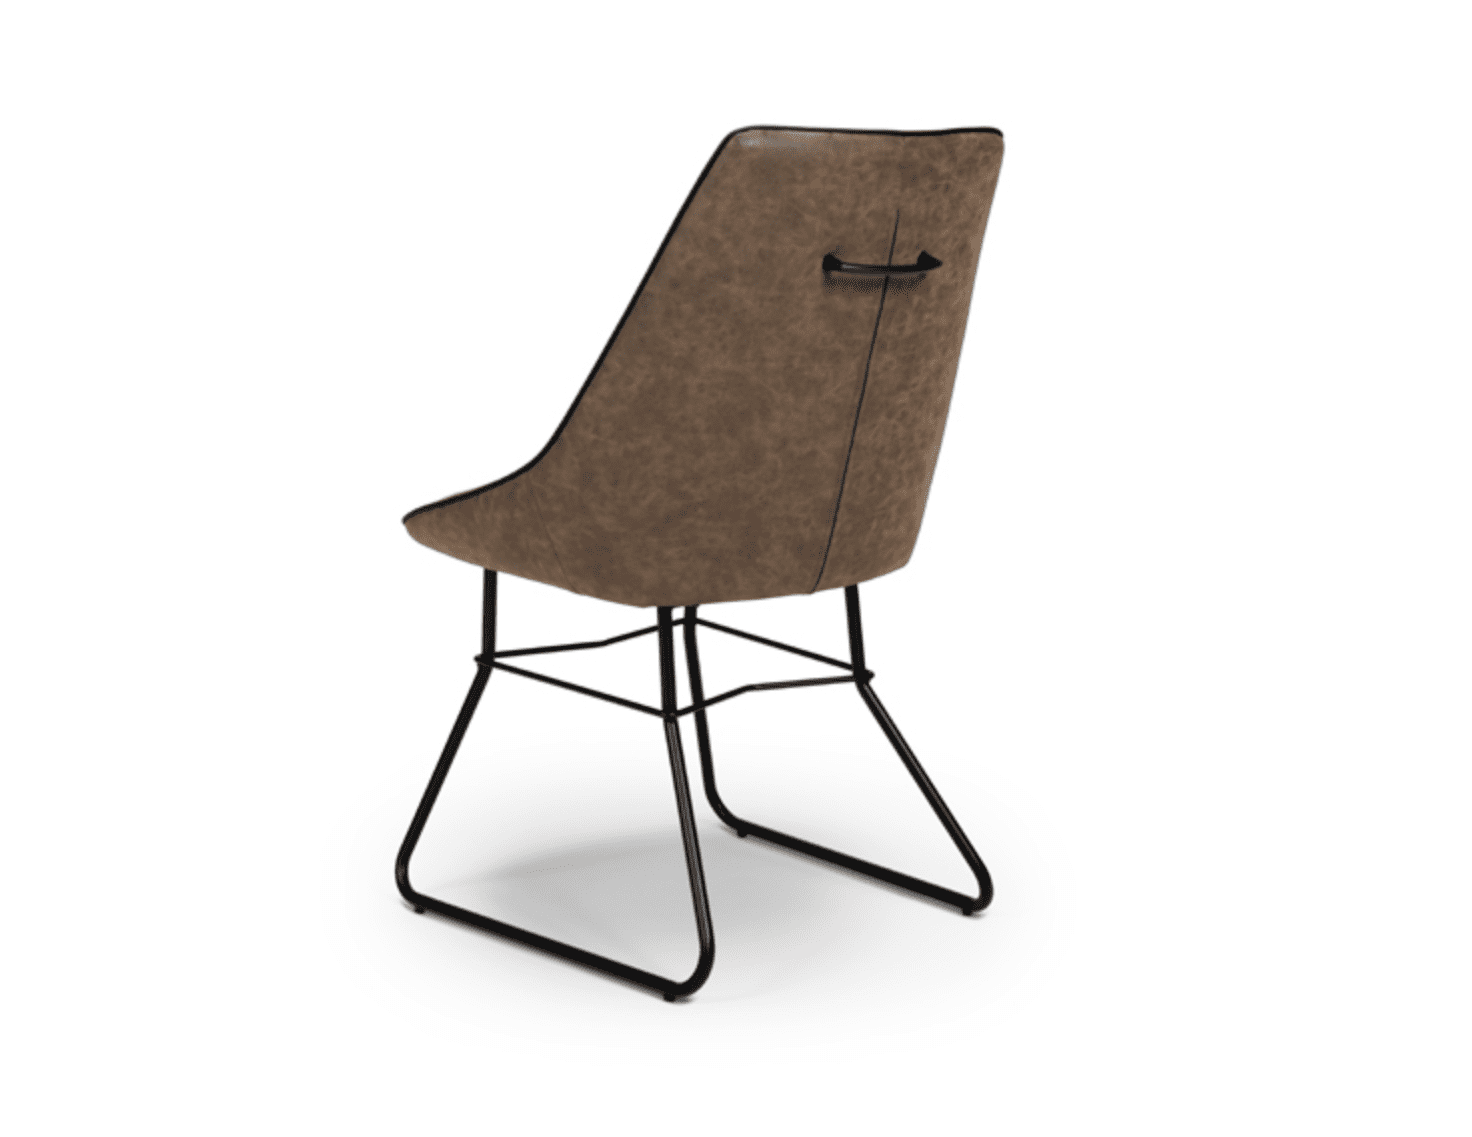 cooper chair wax tan back view